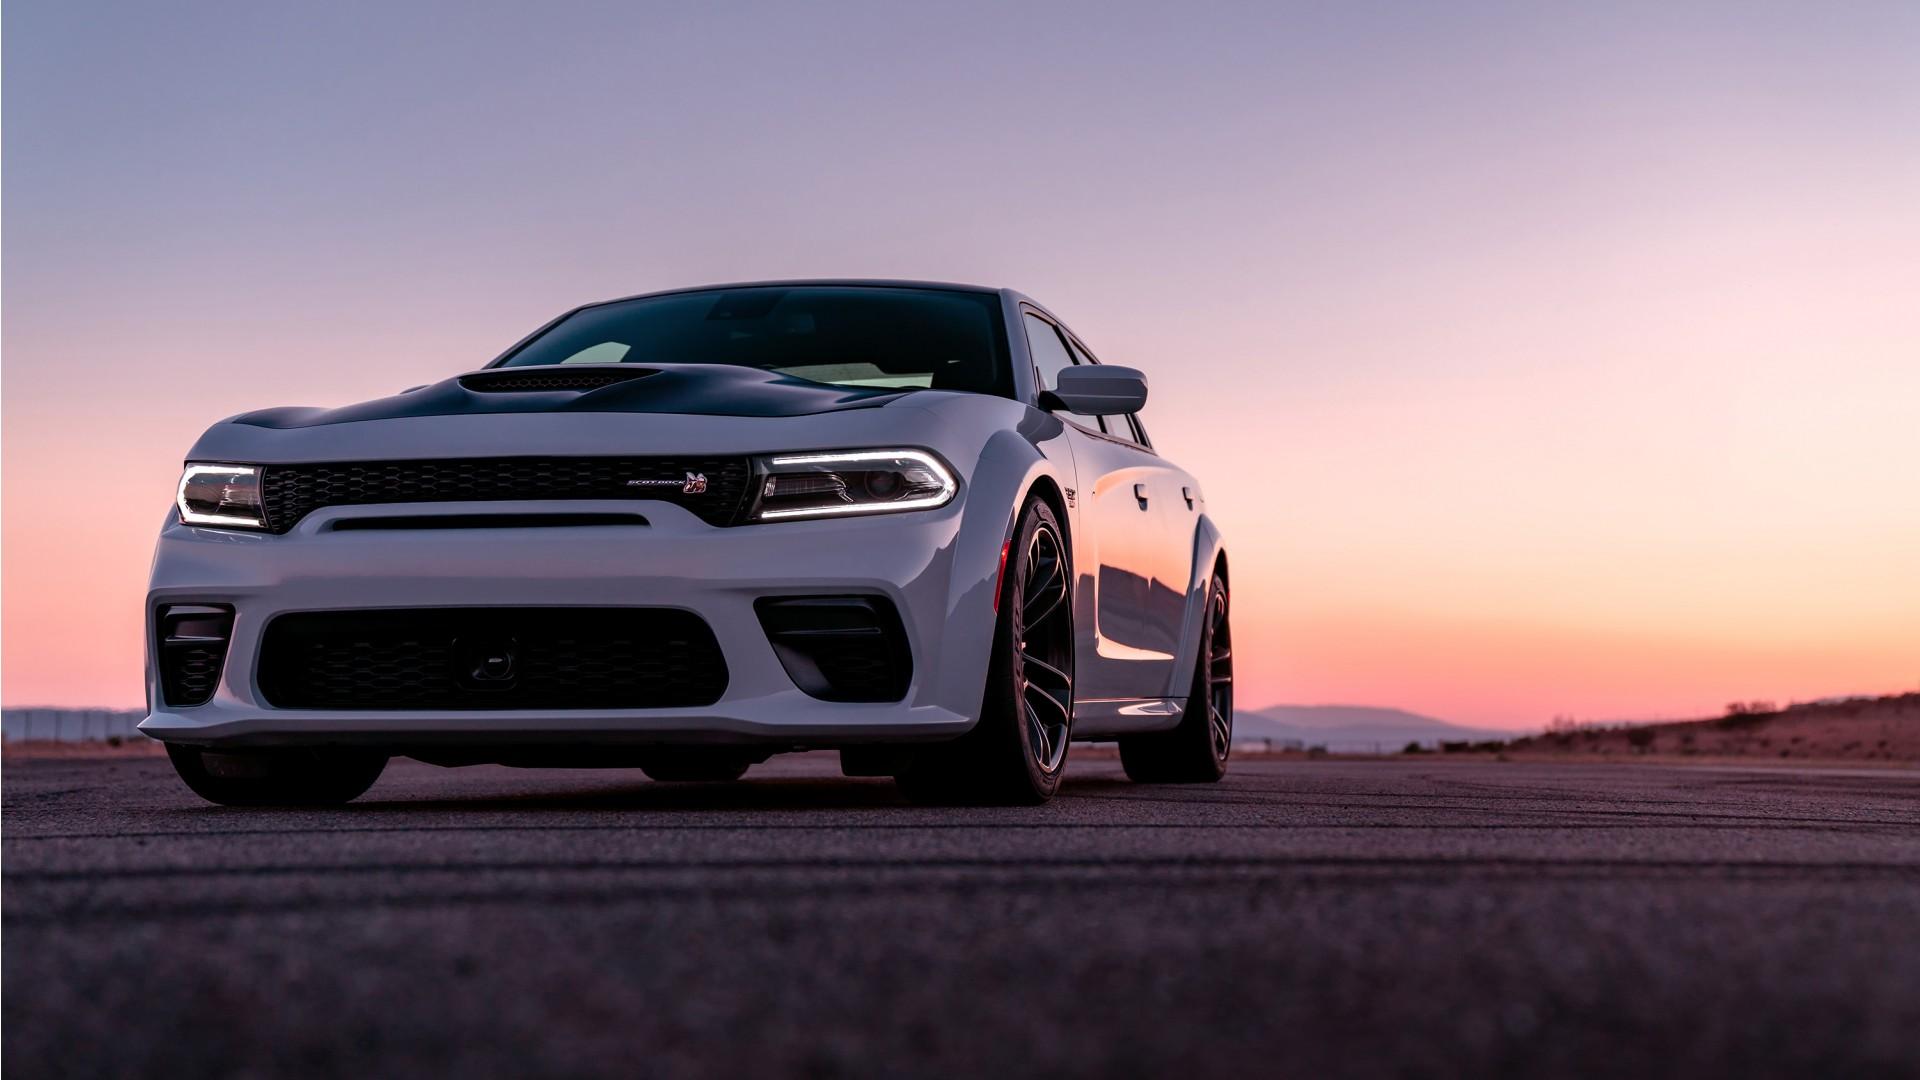 Challenger Srt Hellcat >> 2020 Dodge Charger Scat Pack Widebody Wallpaper | HD Car ...